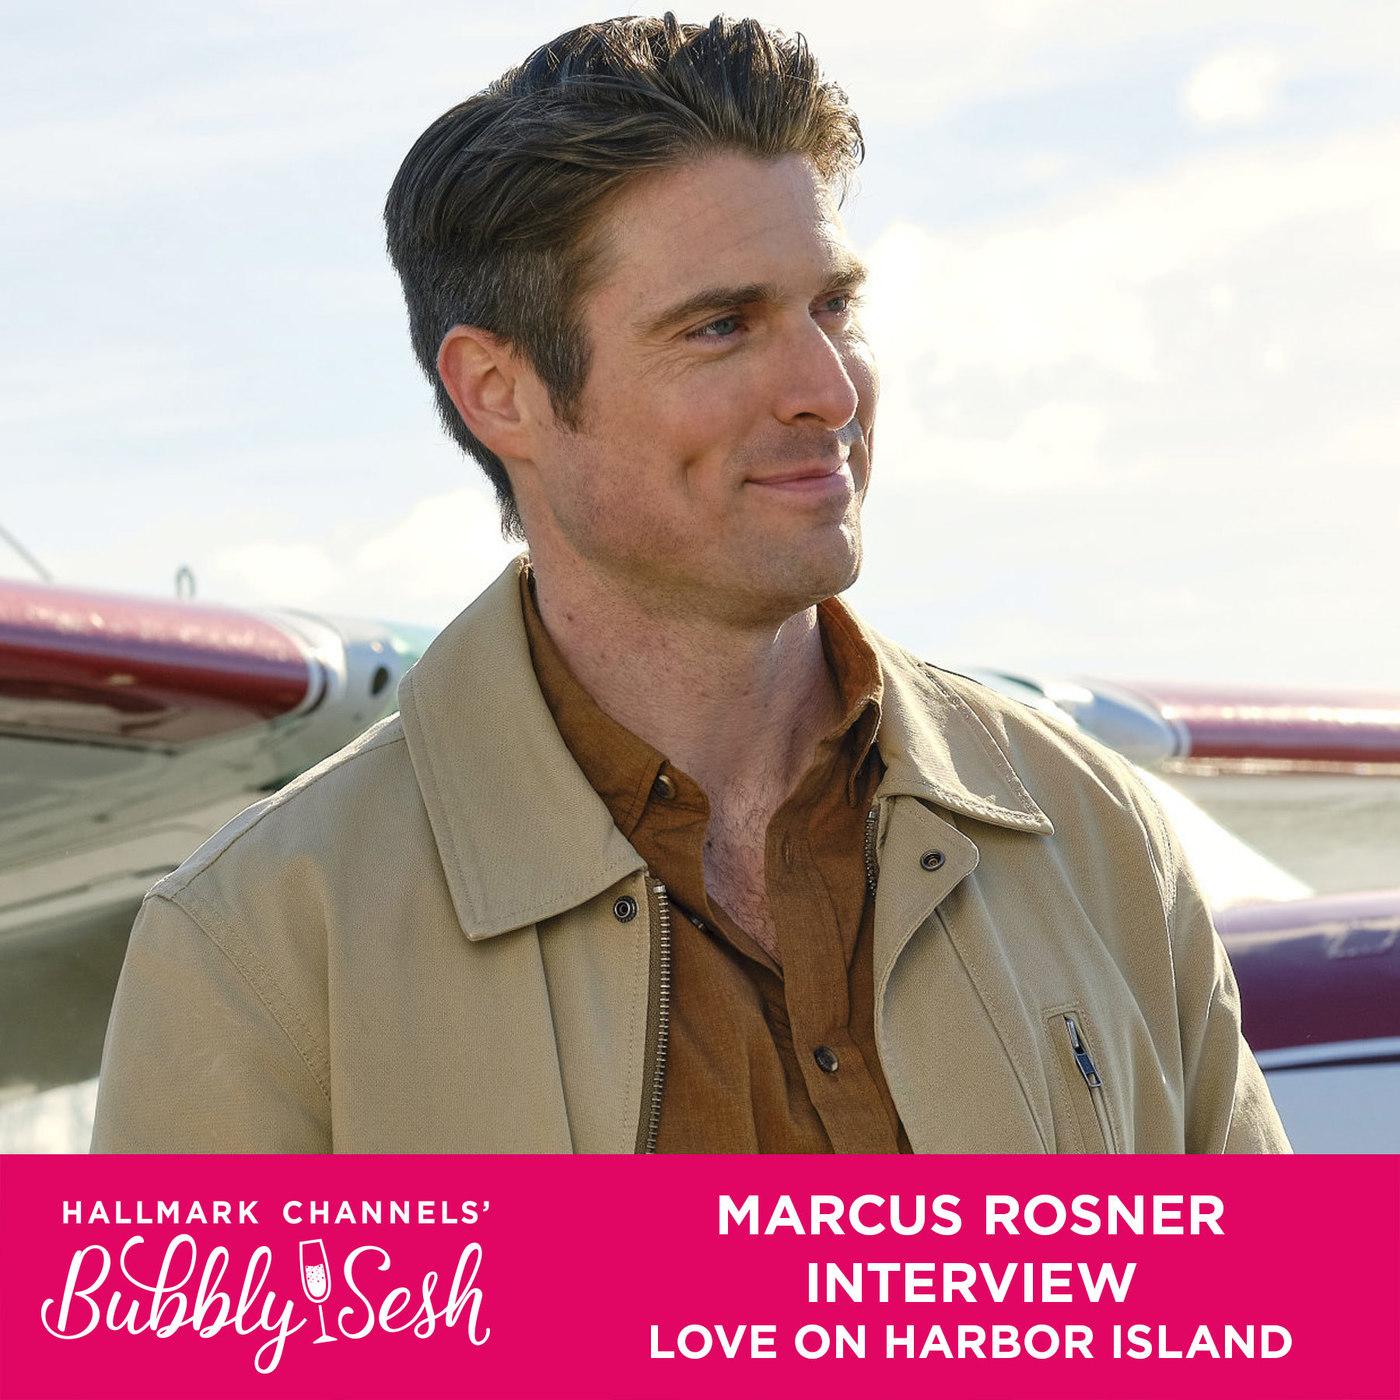 Marcus Rosner Interview, Love on Harbor Island